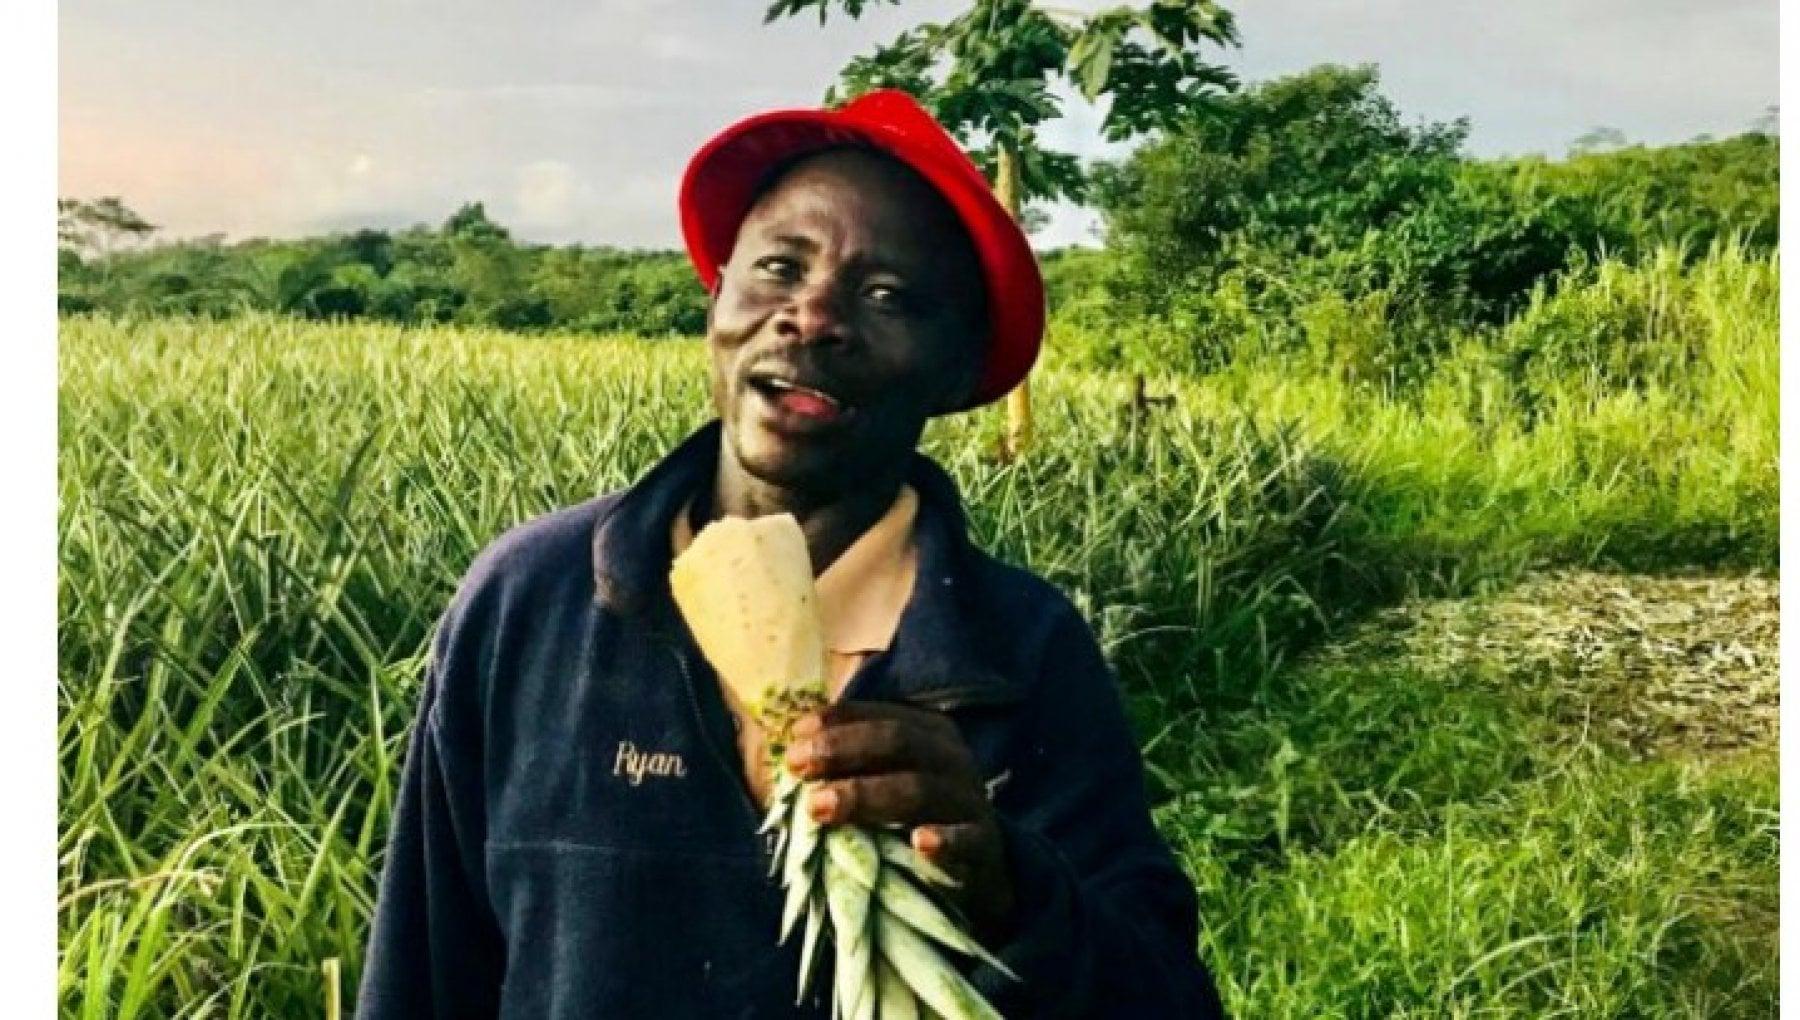 200854873 647ba867 337c 4a4f b40b 1713050167af - Testimonial dell'ananas a sua insaputa: contadino del Ghana vince la battaglia contro i supermercati olandesi